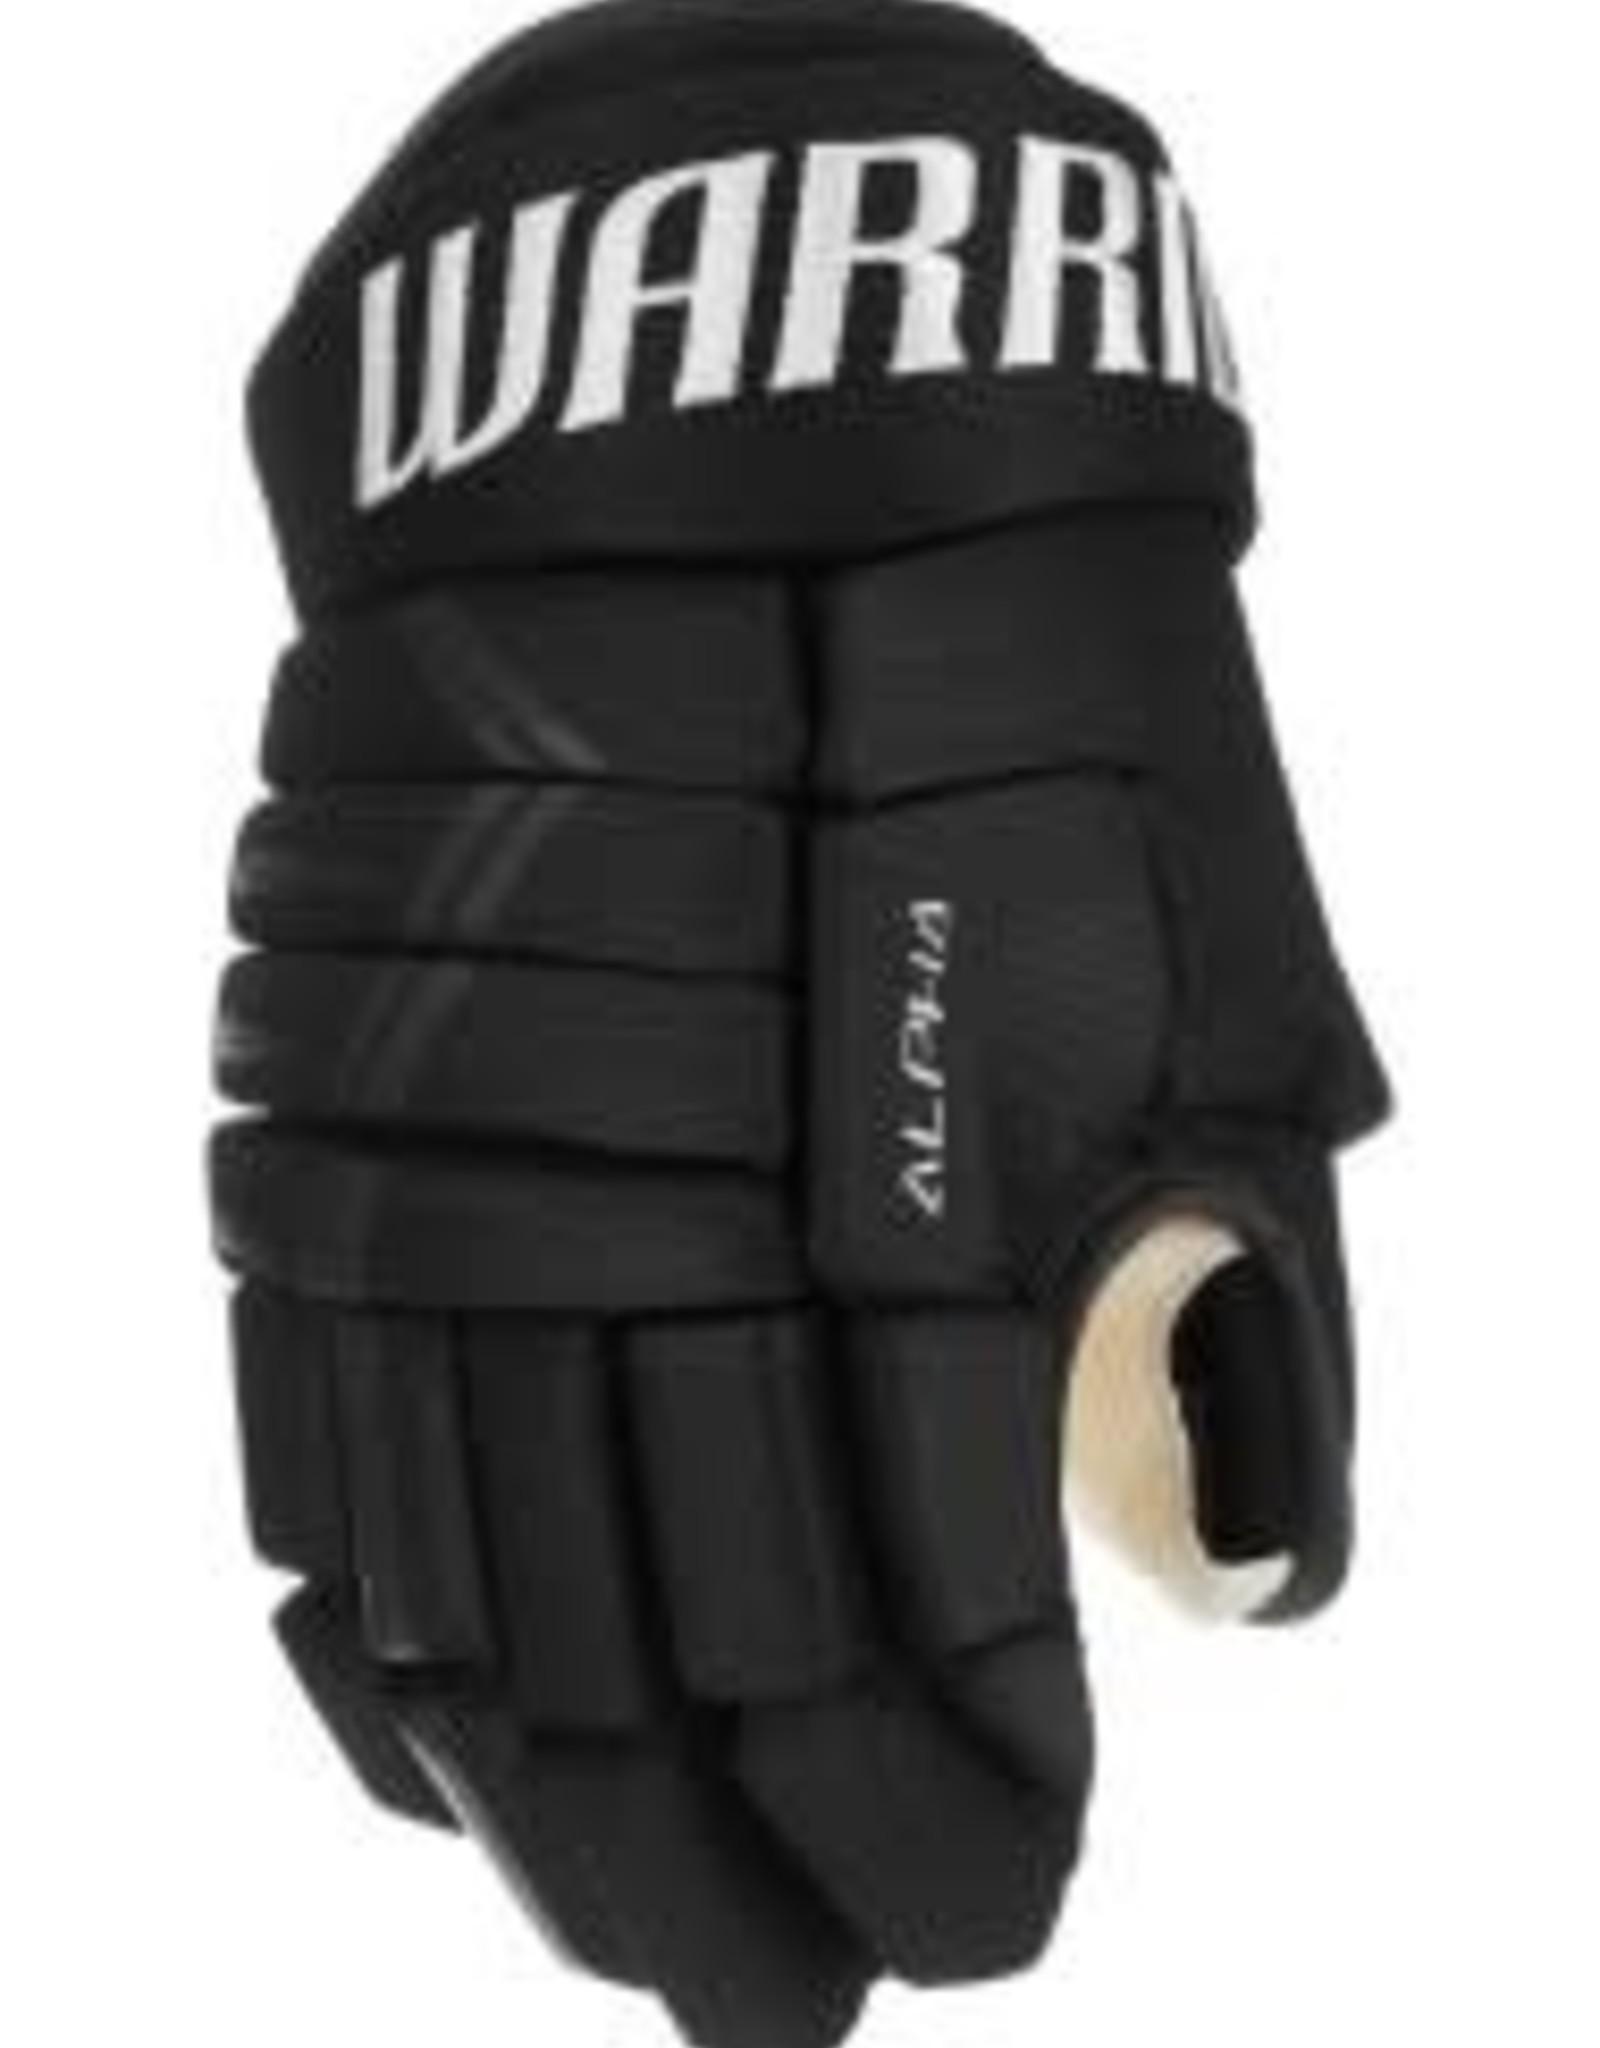 DX4 Senior Glove BK Black 15